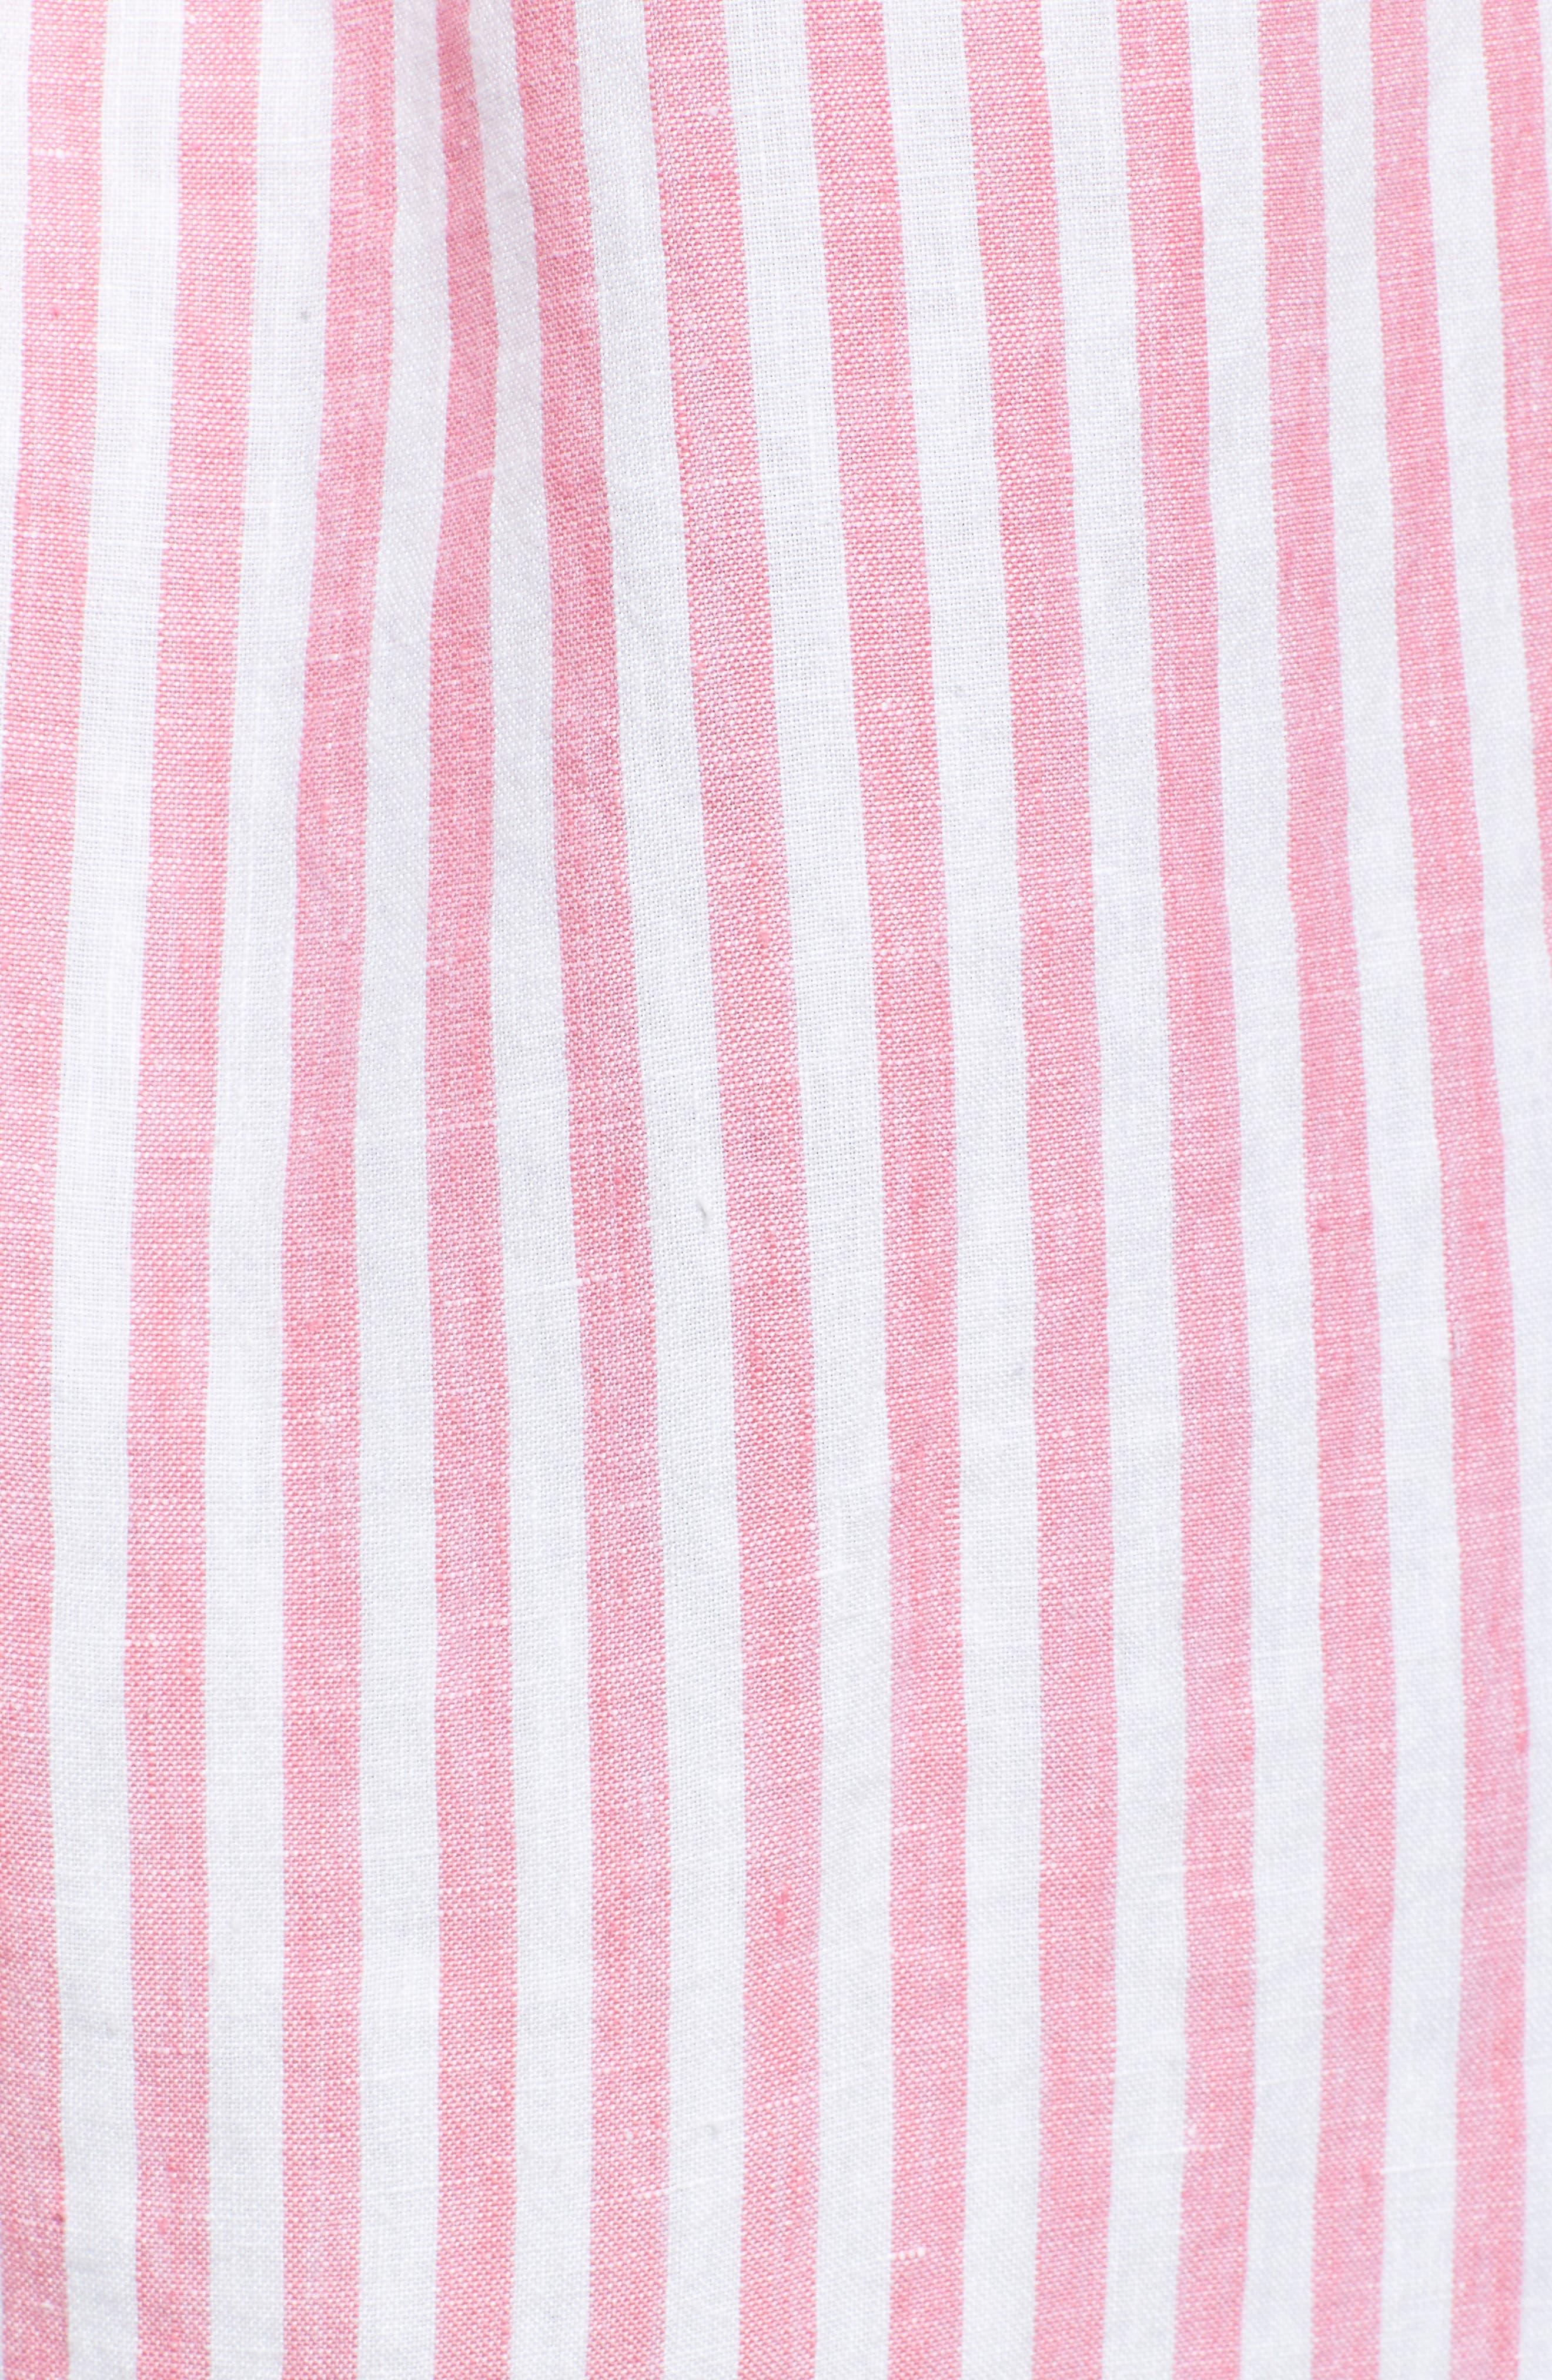 Cabana Stripe Button-Up Top,                             Alternate thumbnail 5, color,                             Soft Flamingo